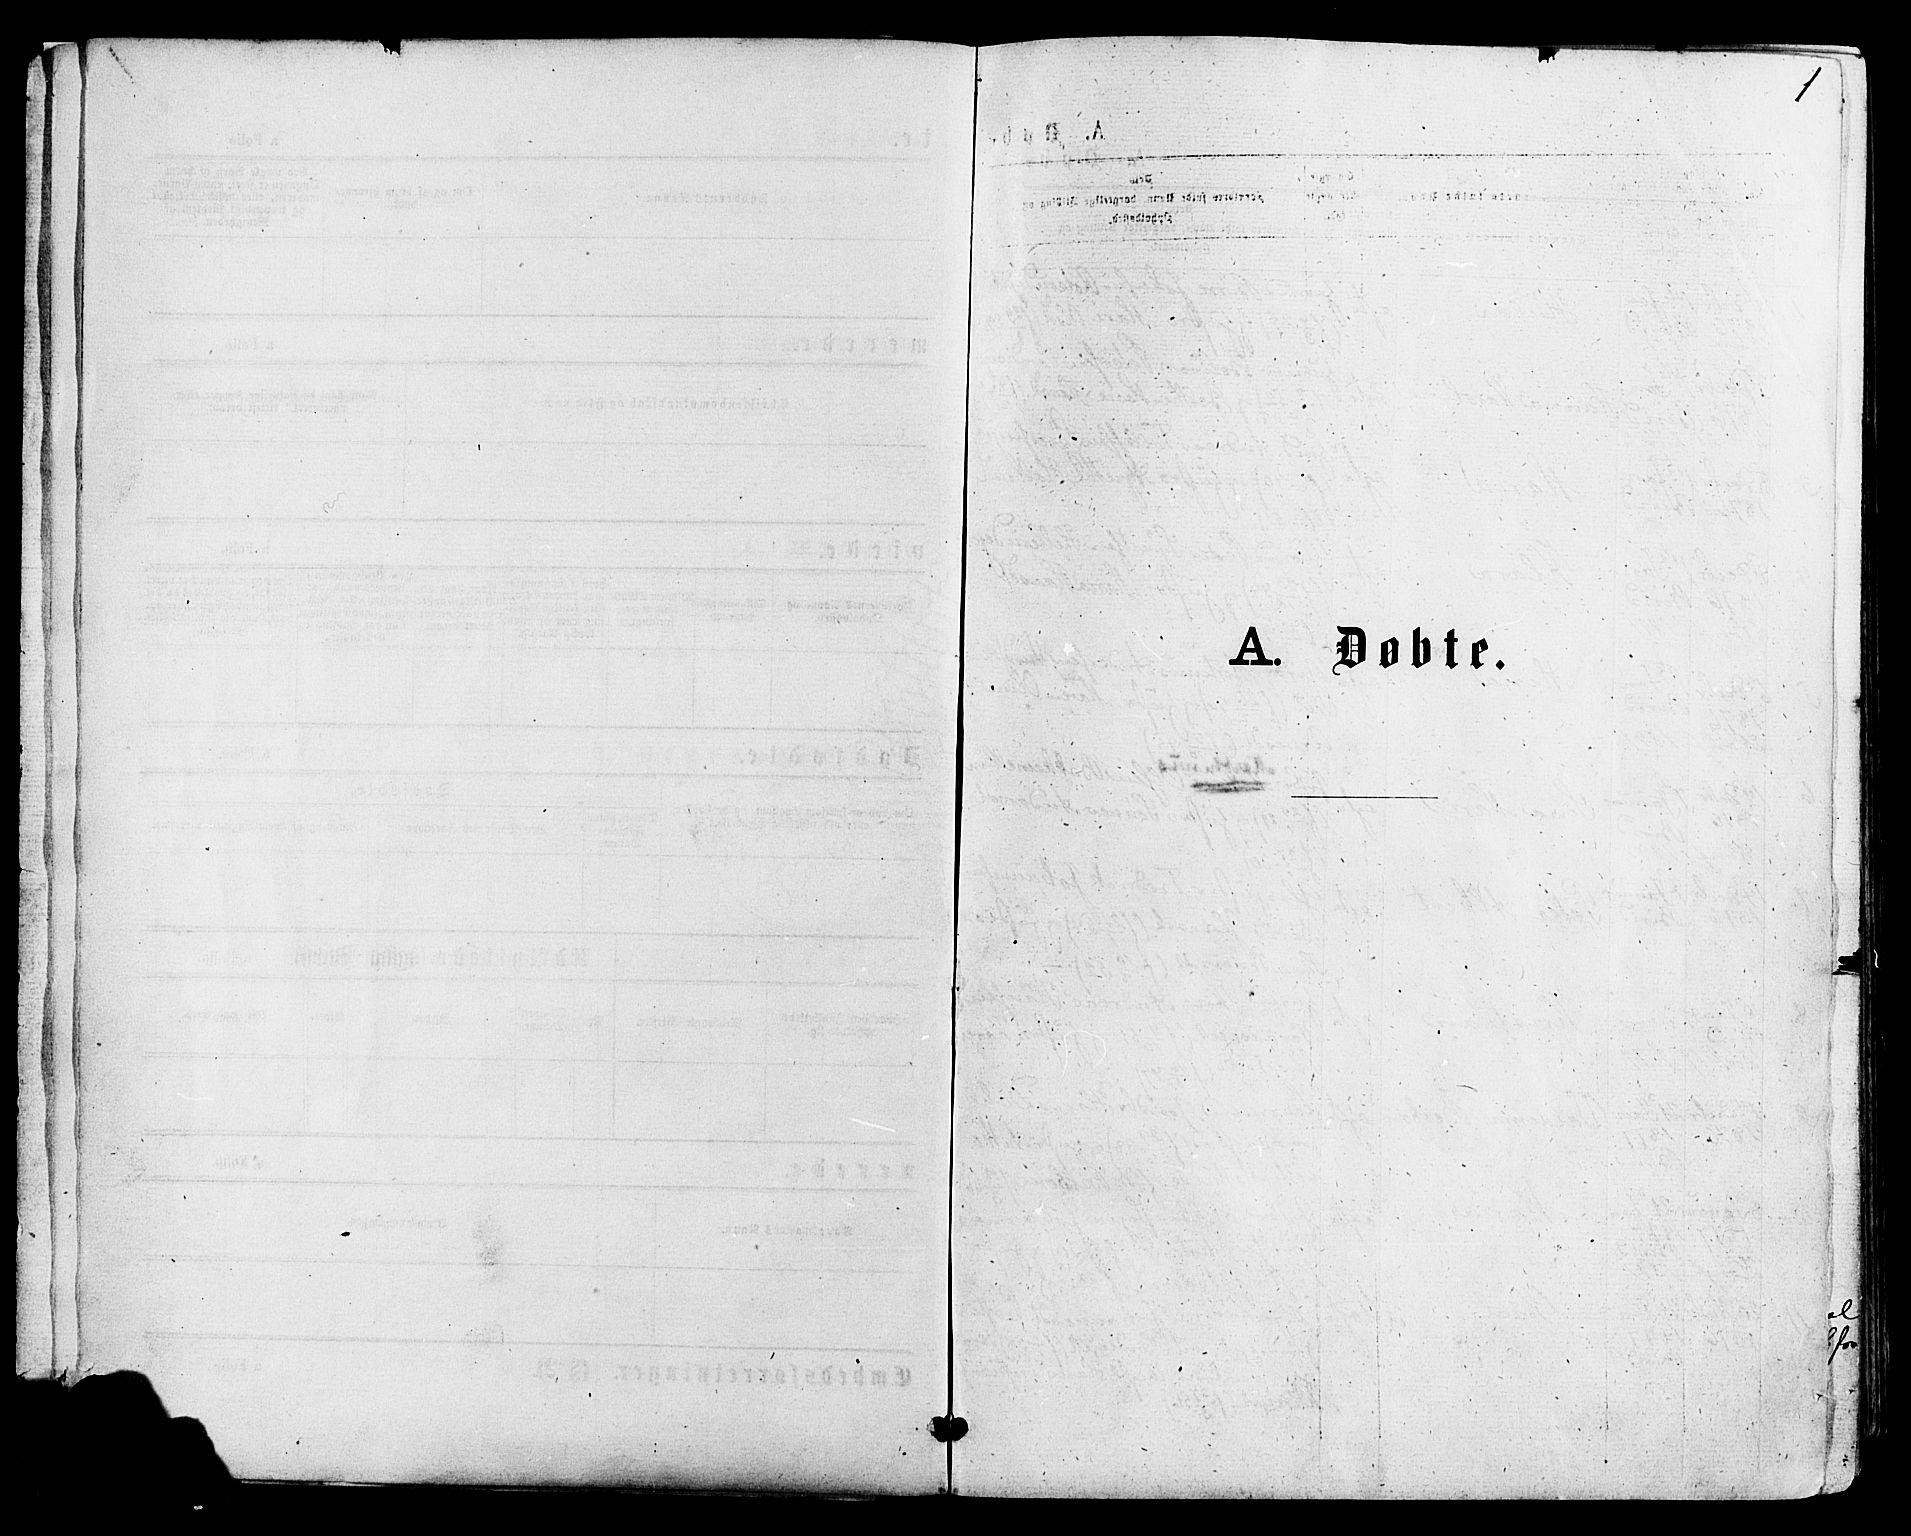 SAH, Biri prestekontor, Ministerialbok nr. 6, 1877-1886, s. 1